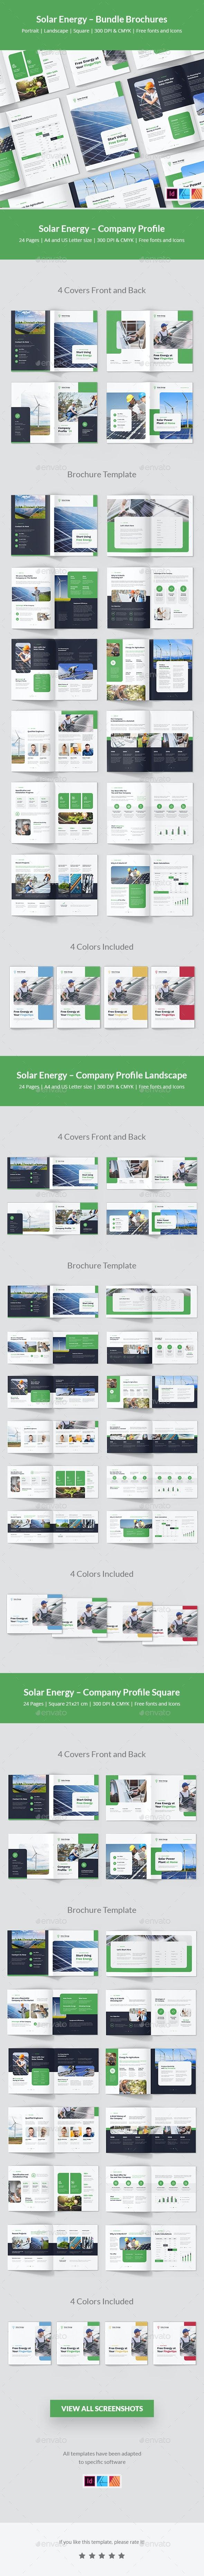 Solar Energy – Comapny Profile Bundle Brochures 3 in 1 - Corporate Brochures